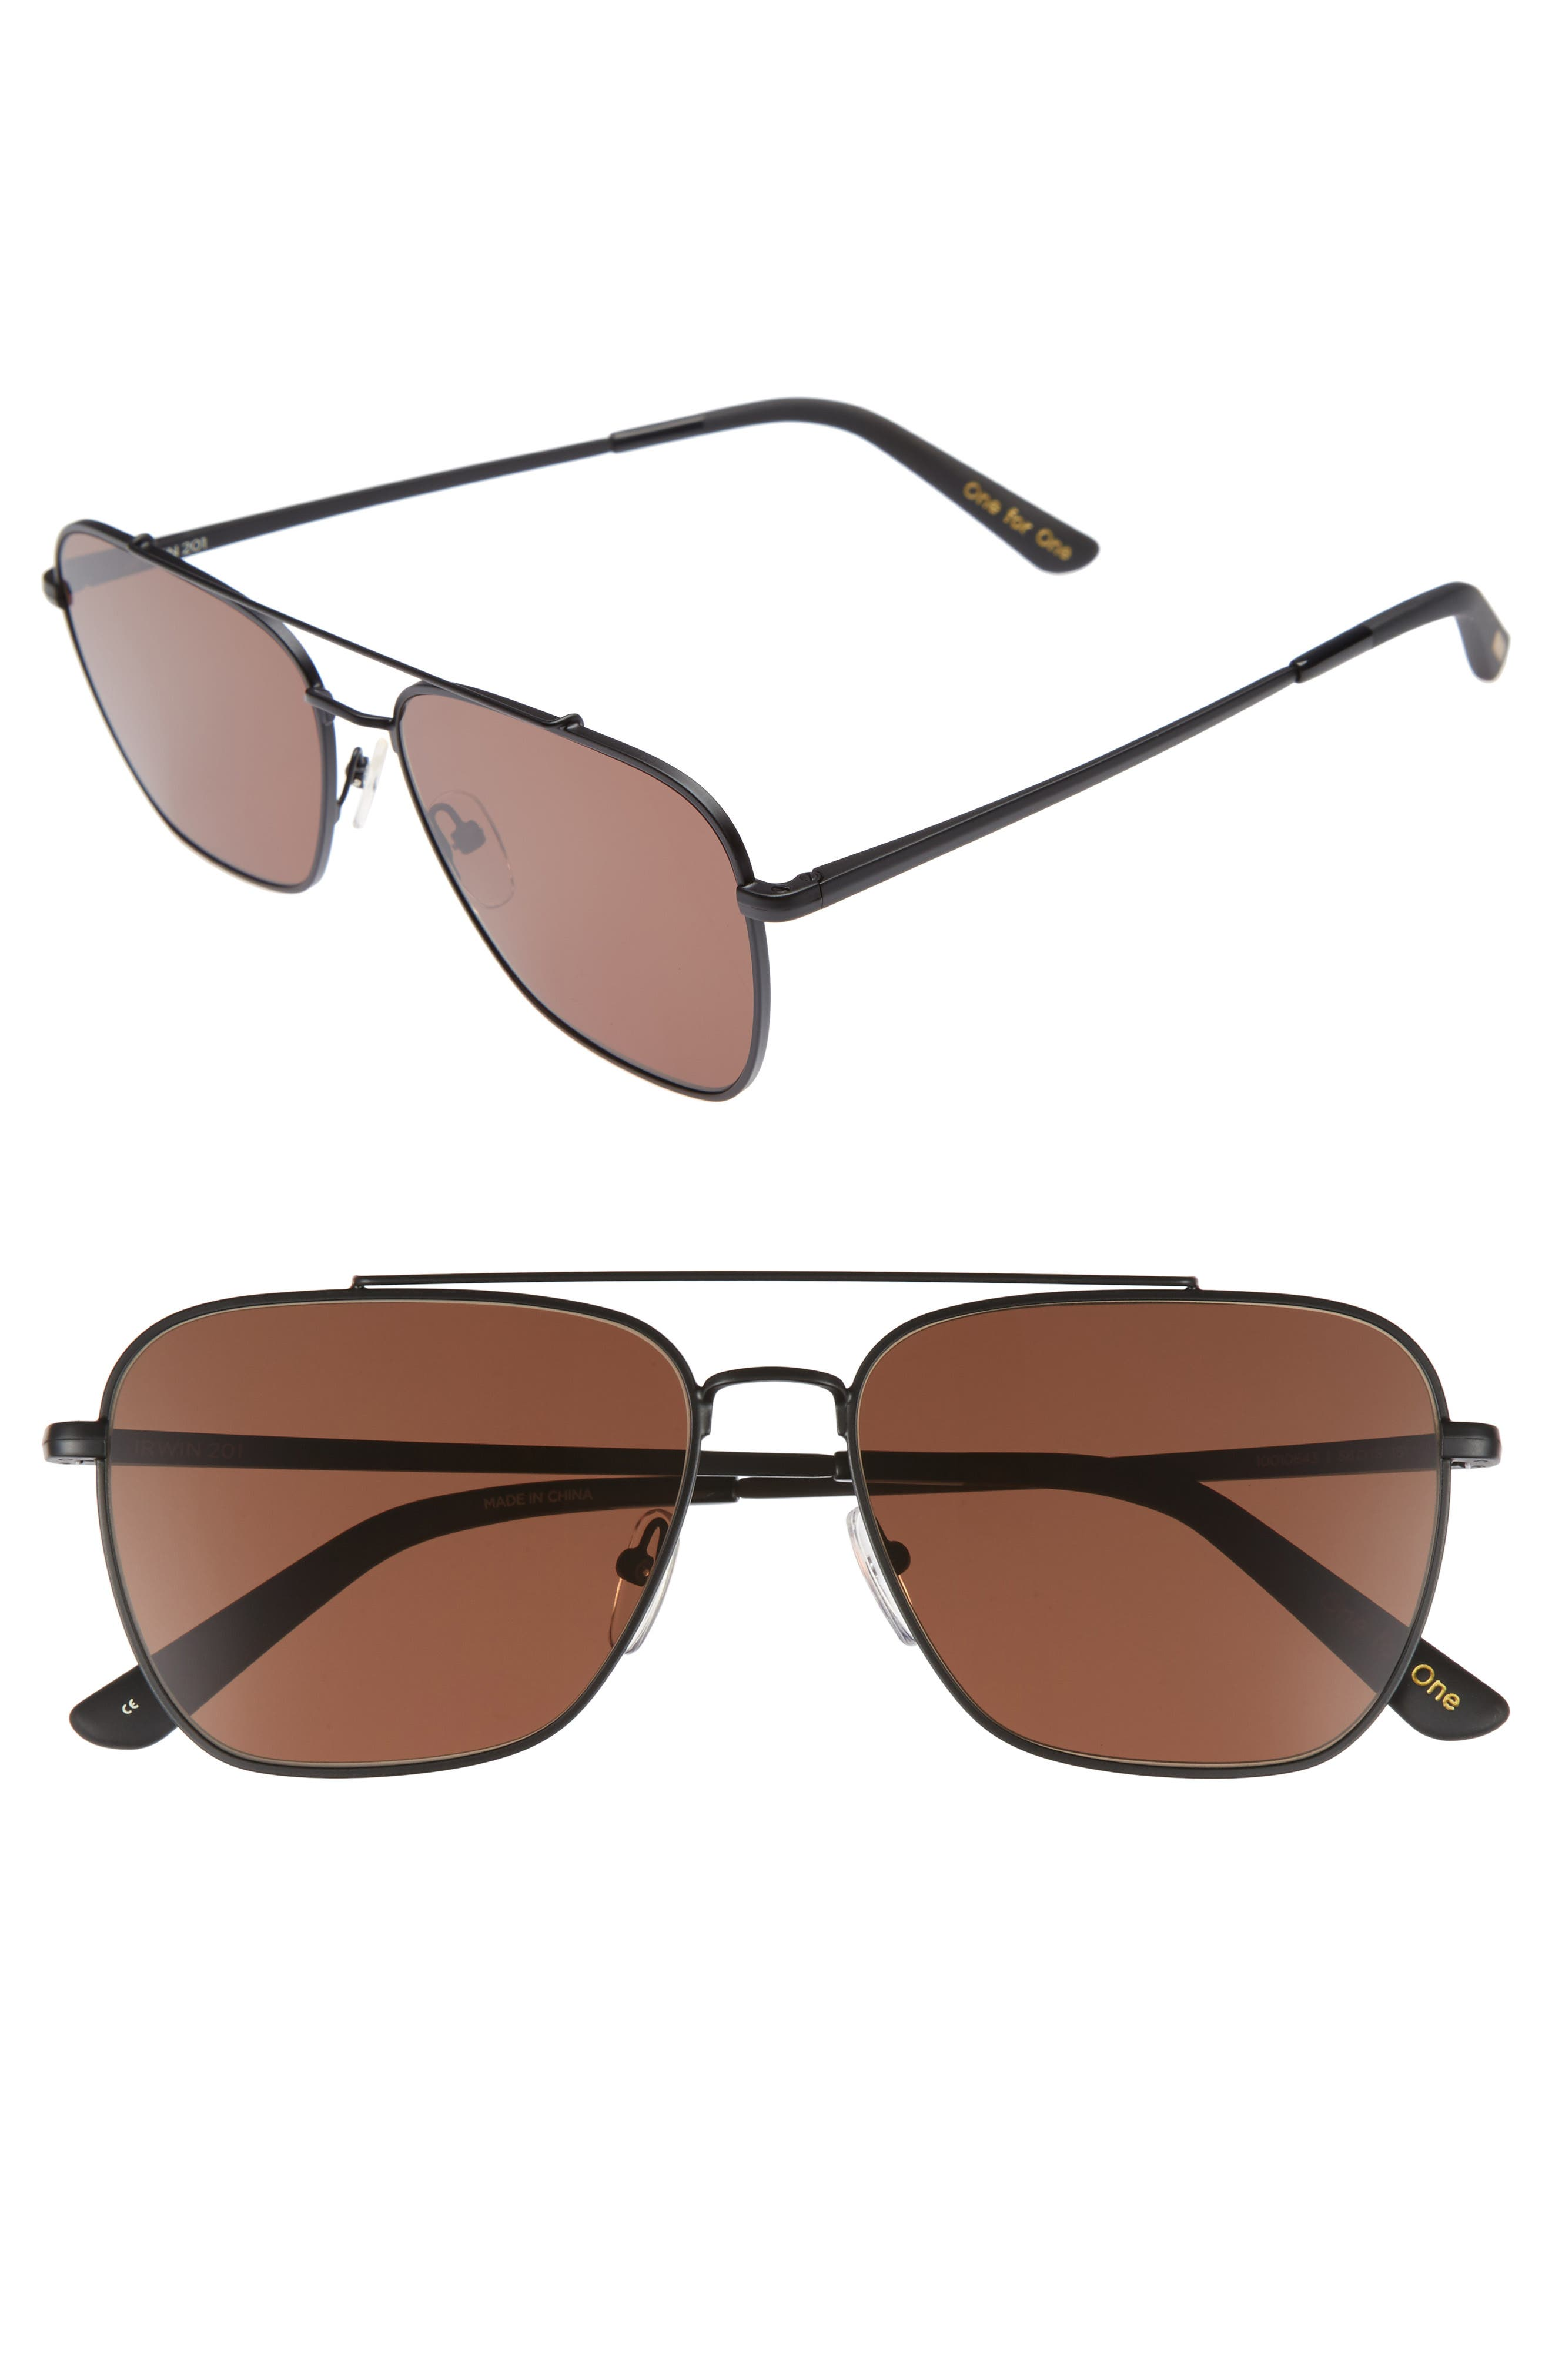 Irwin 58mm Sunglasses,                             Main thumbnail 1, color,                             Matte Black